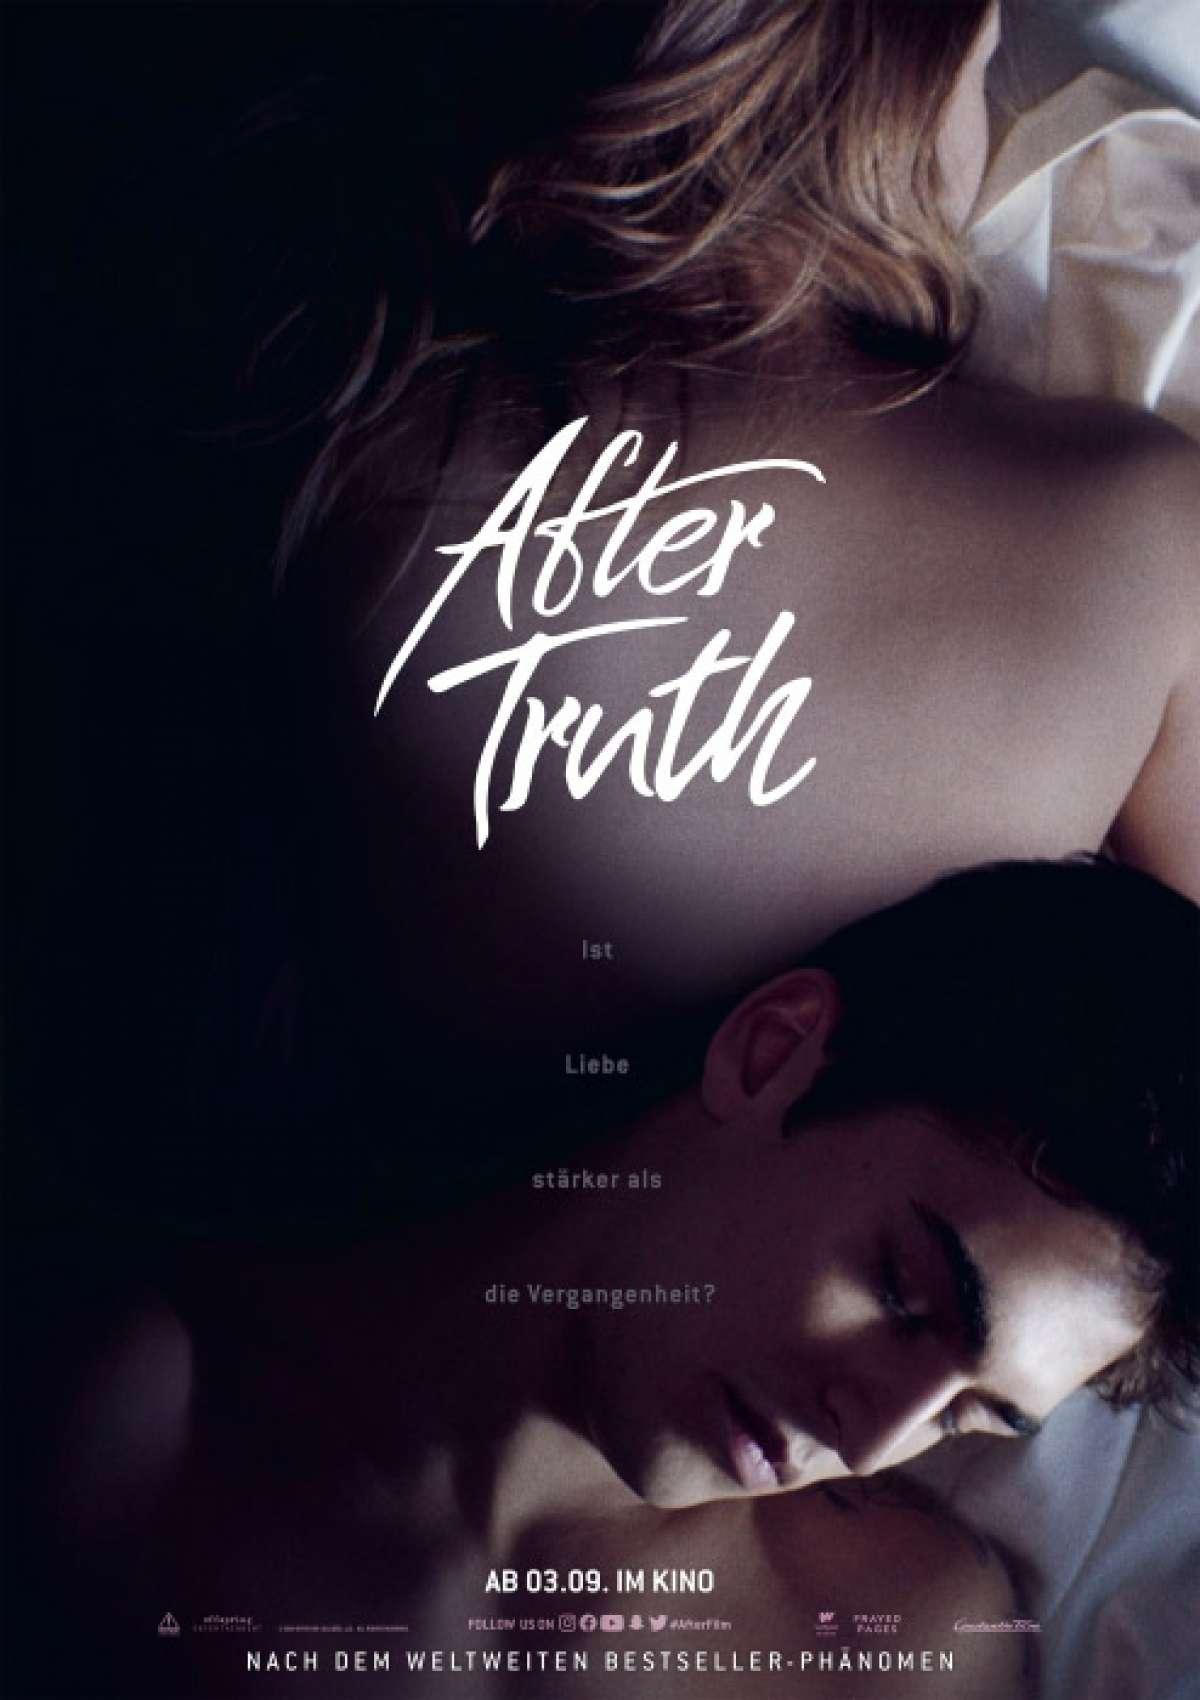 After Truth - Burgtheater Kino Teysa - Schwalmstadt-Treysa